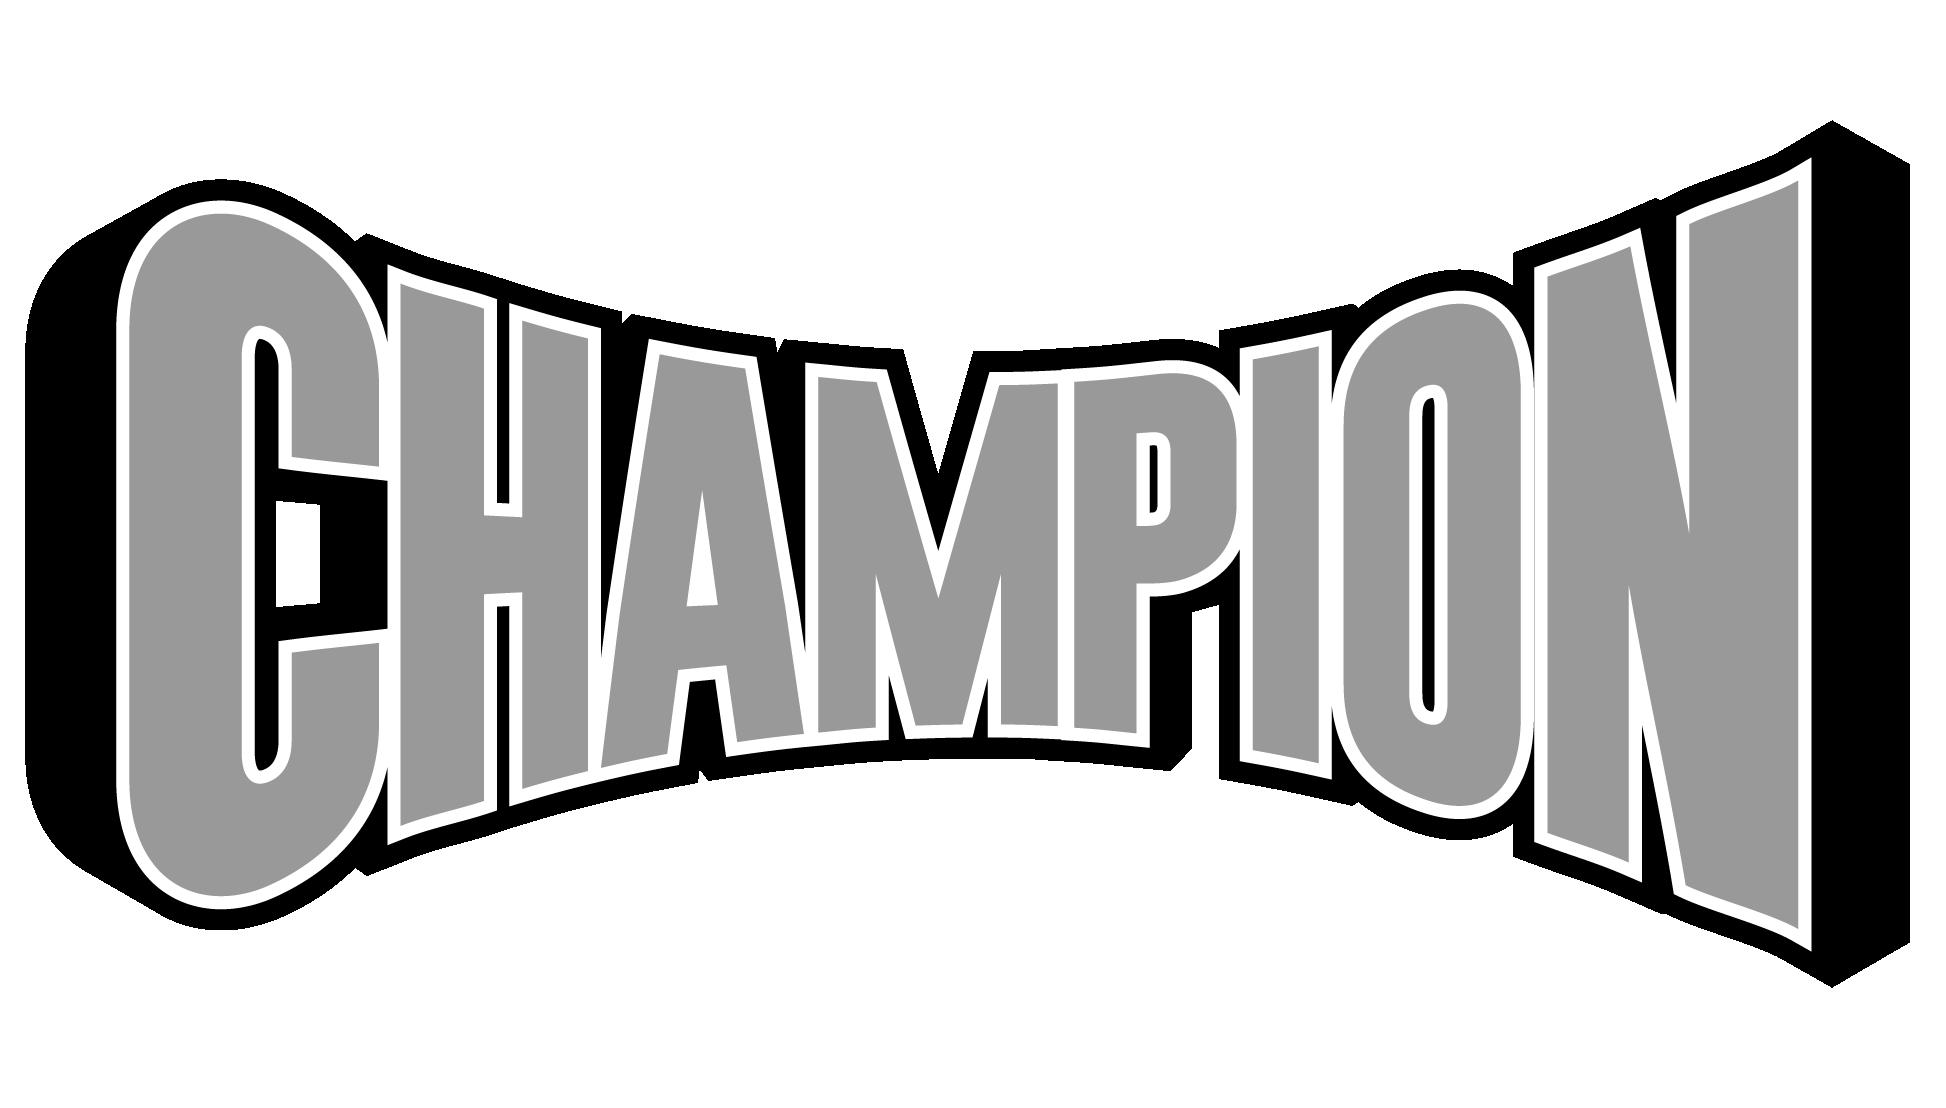 Champion Ford Owensboro Ky >> New Used Mazda Cars Champion Mazda Owensboro Ky